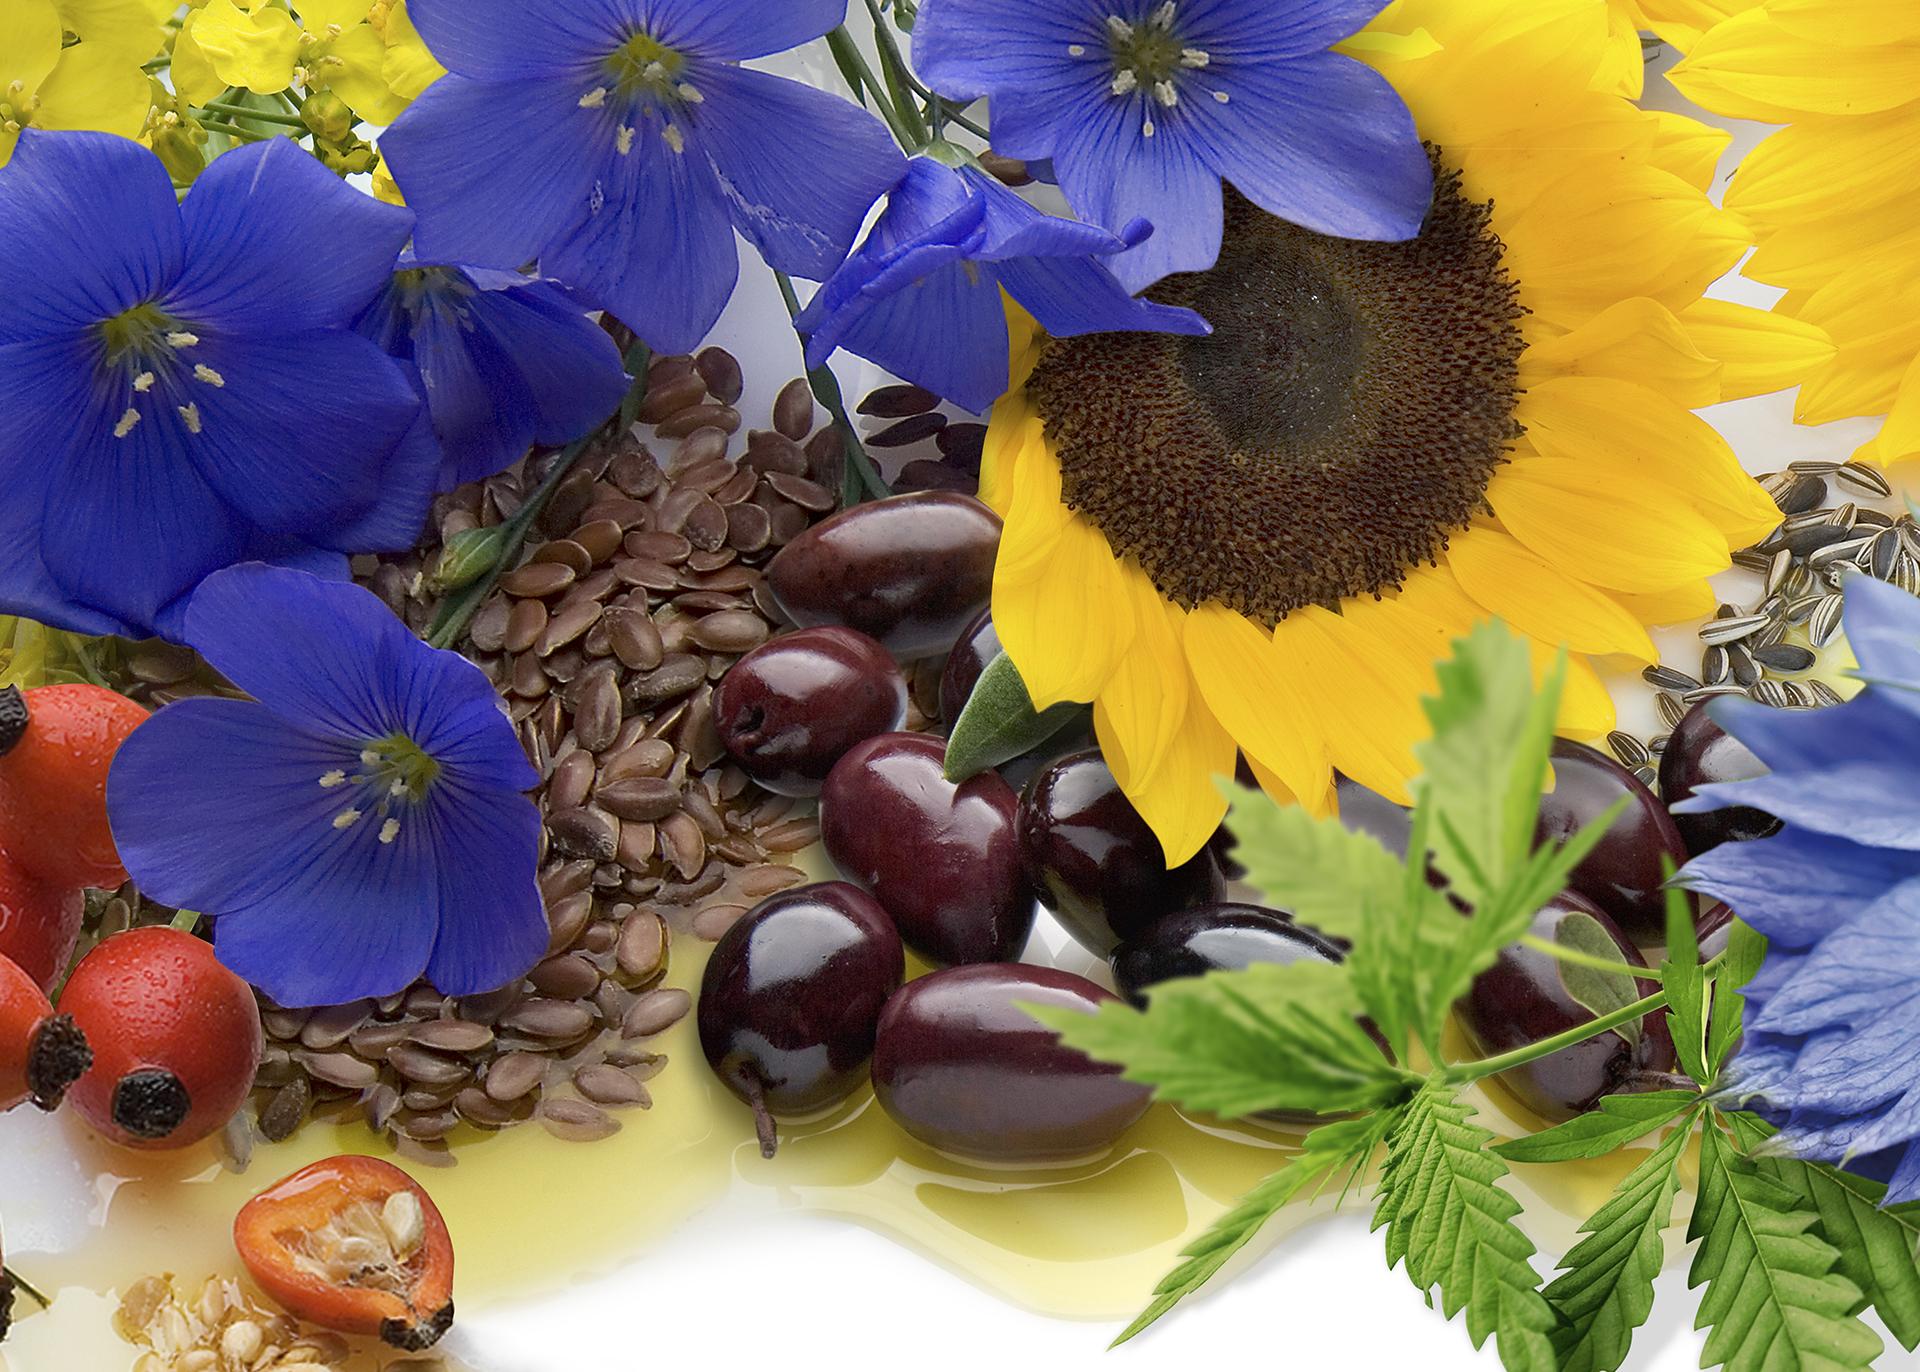 Oils-Fats-Waxes-by_Henry-Lamotte-Oils